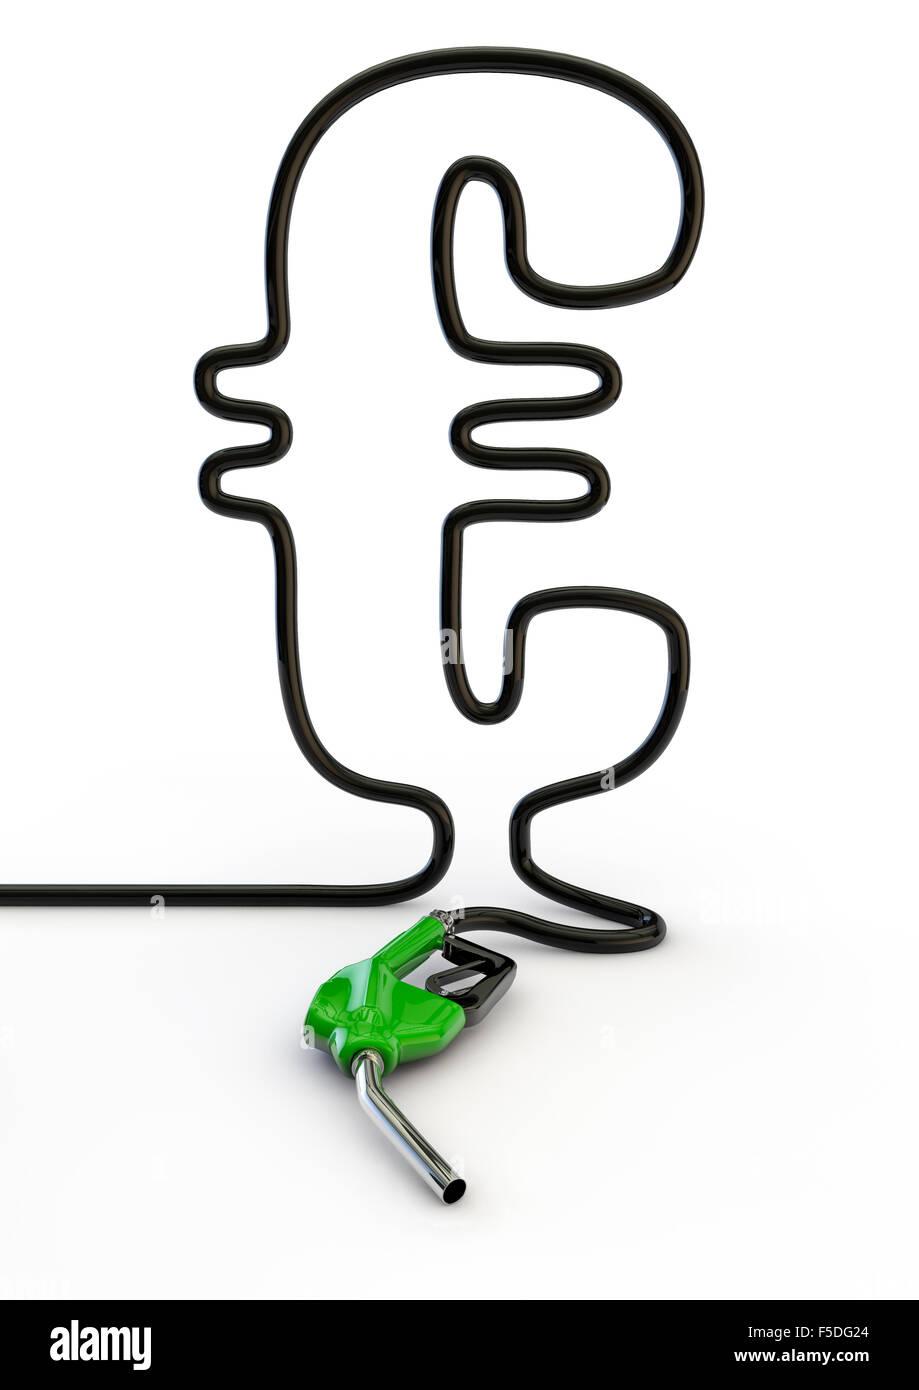 Euro hose / 3D render of petrol hose forming euro symbol - Stock Image